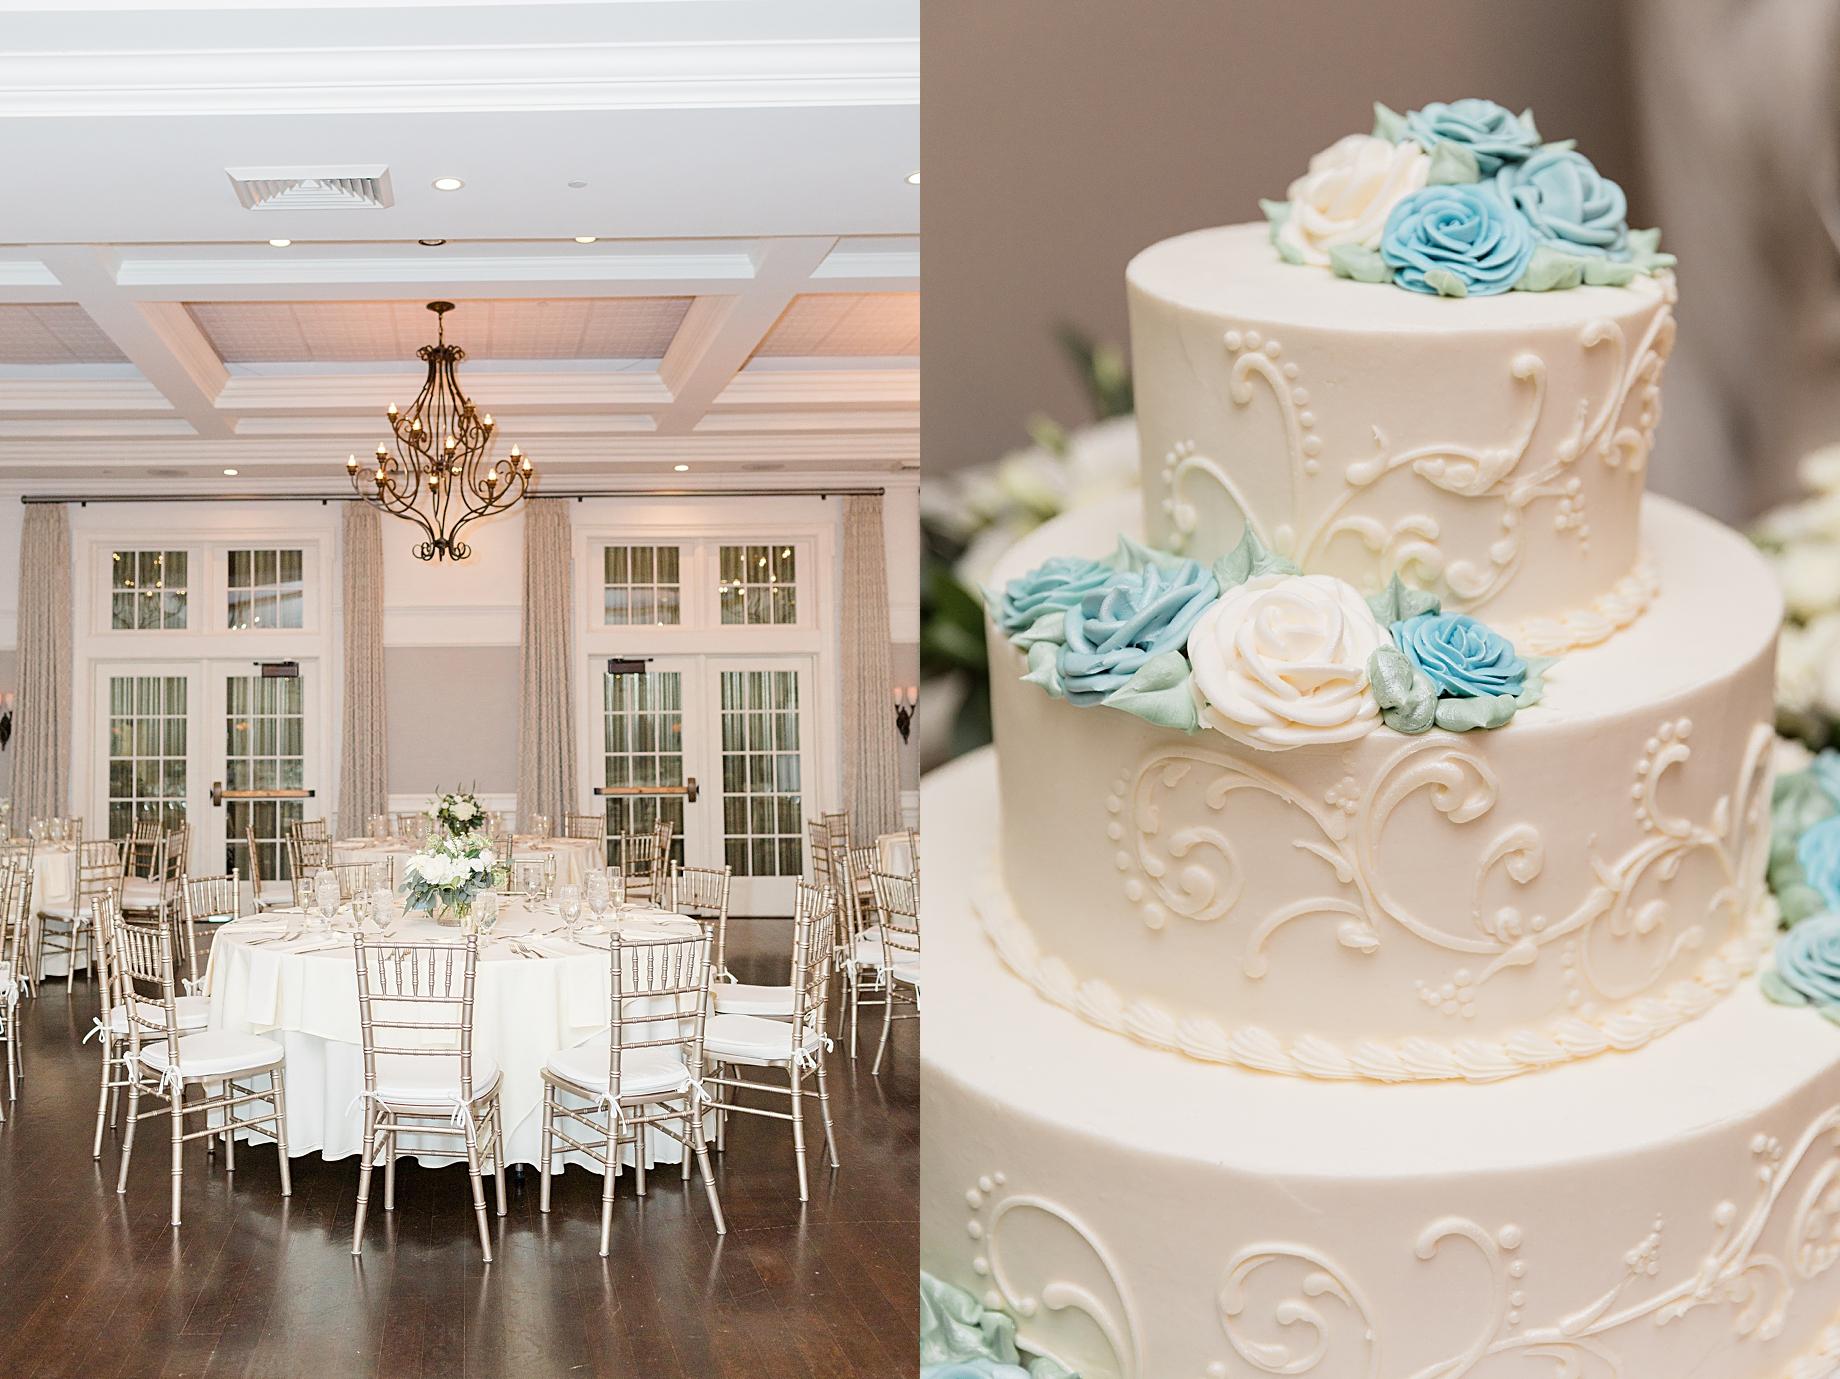 French Creek Golf Club Wedding Reception | Cake by Baker's of Buffington